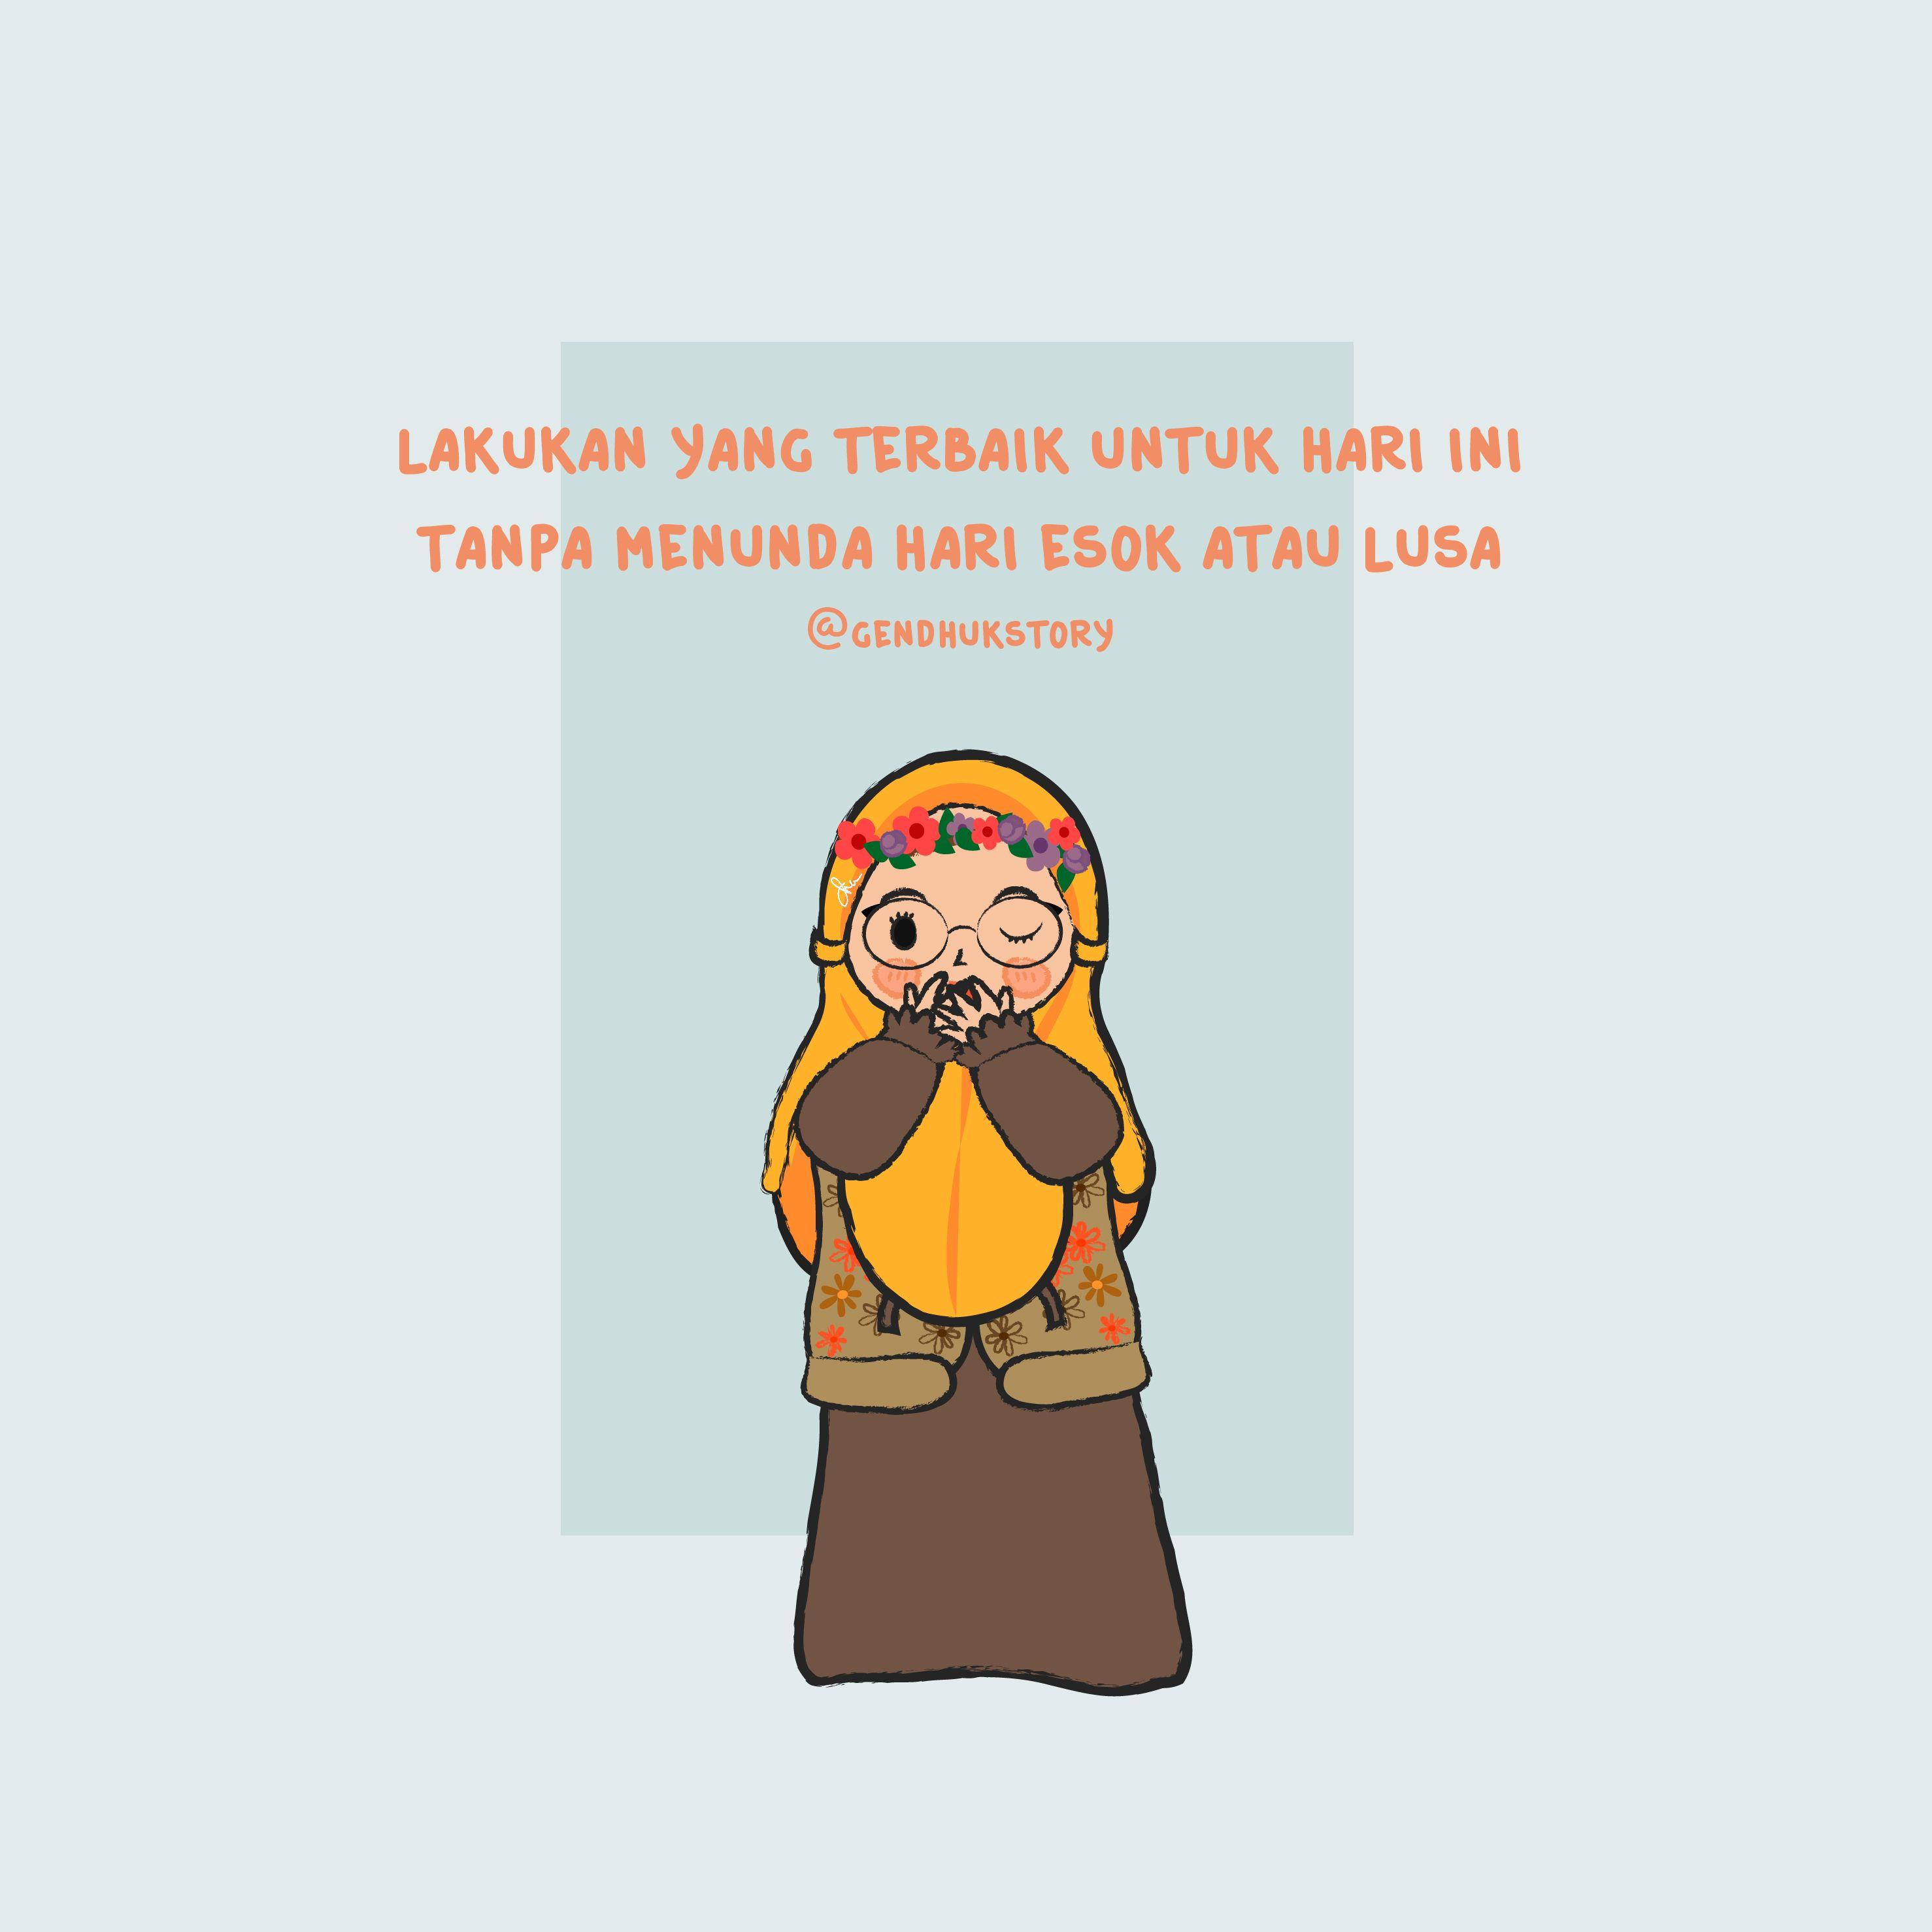 Pin oleh Catatan Pendek di muslimah gendhukstory